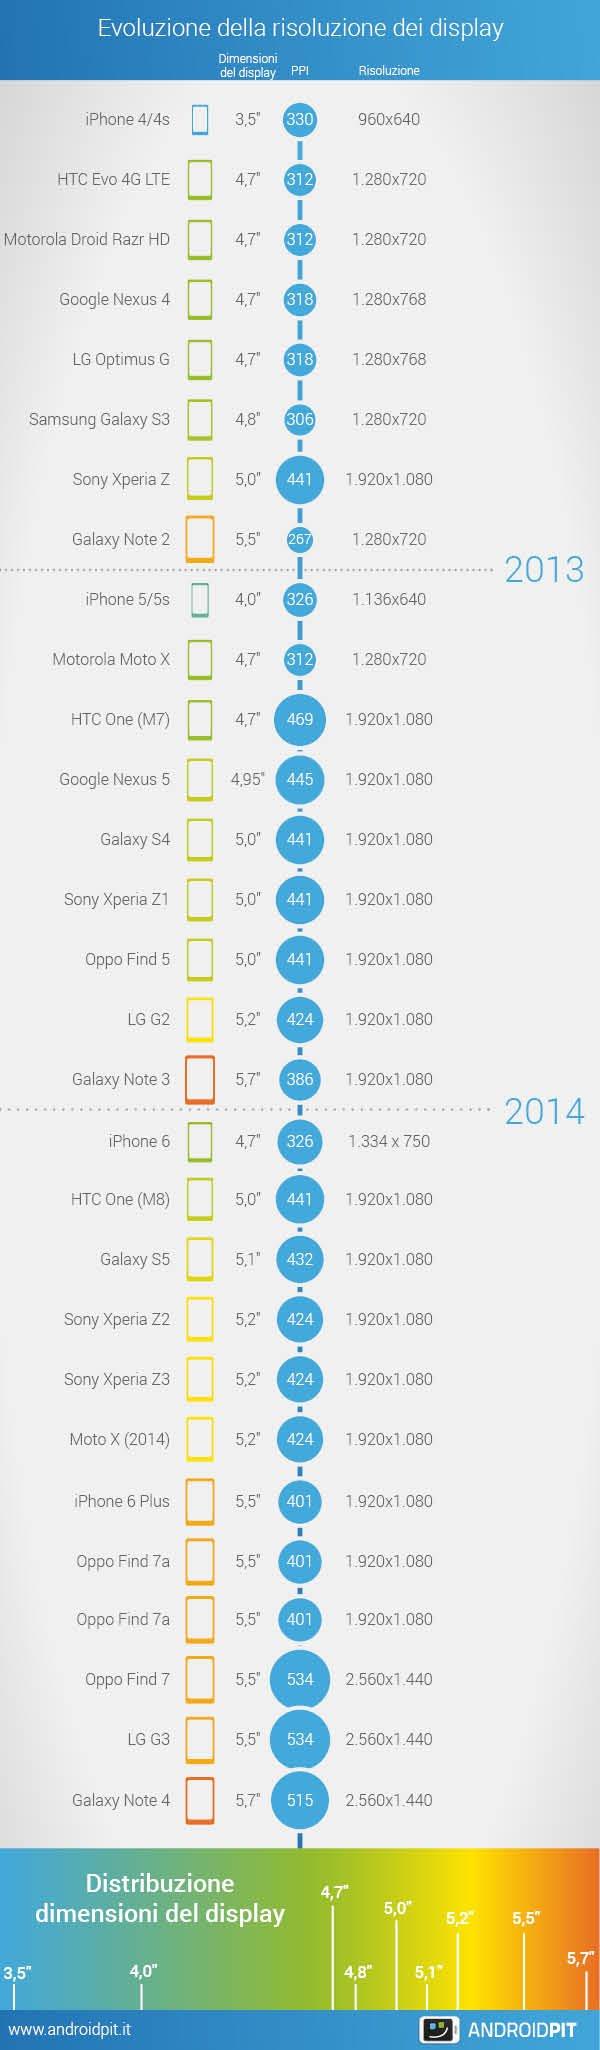 infographic screen sizes v44